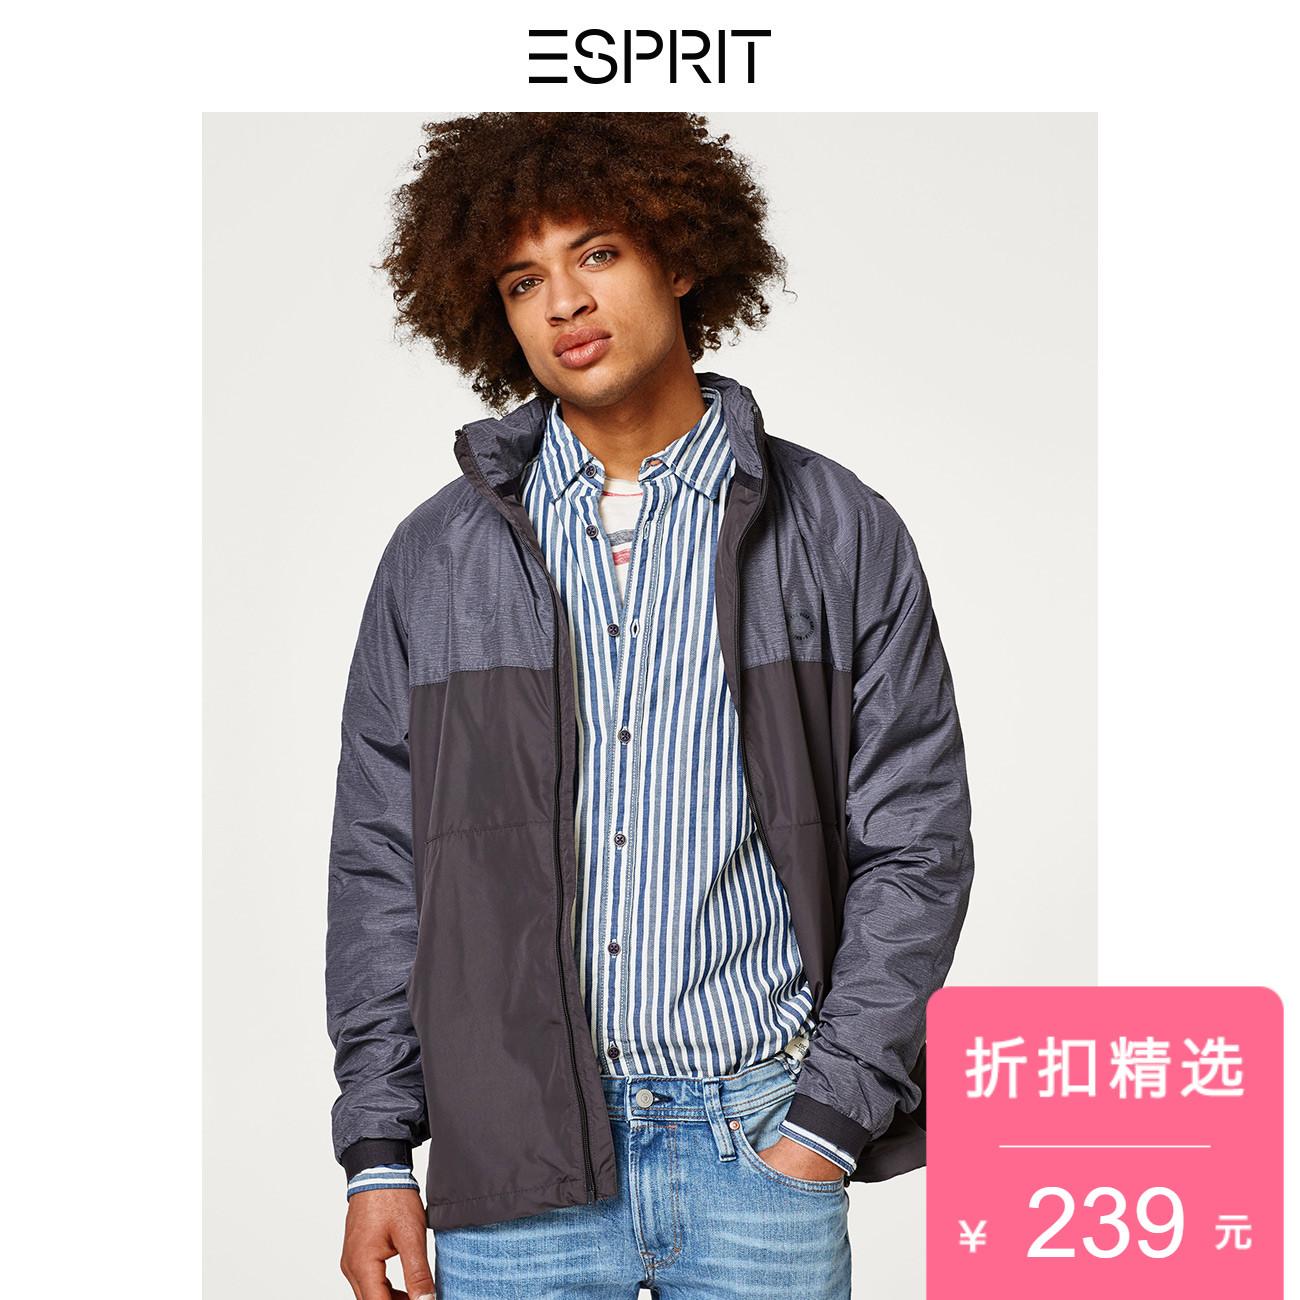 ESPRIT EDC男装潮流迷彩拼色休闲连帽男士长袖外套男-018CC2G005